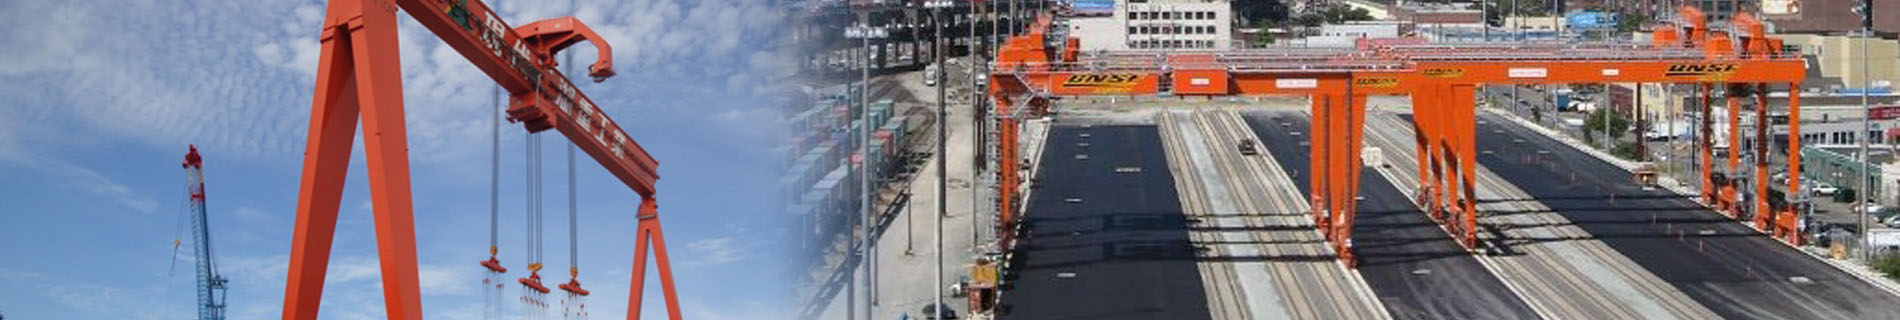 Crane Manufacturers banner